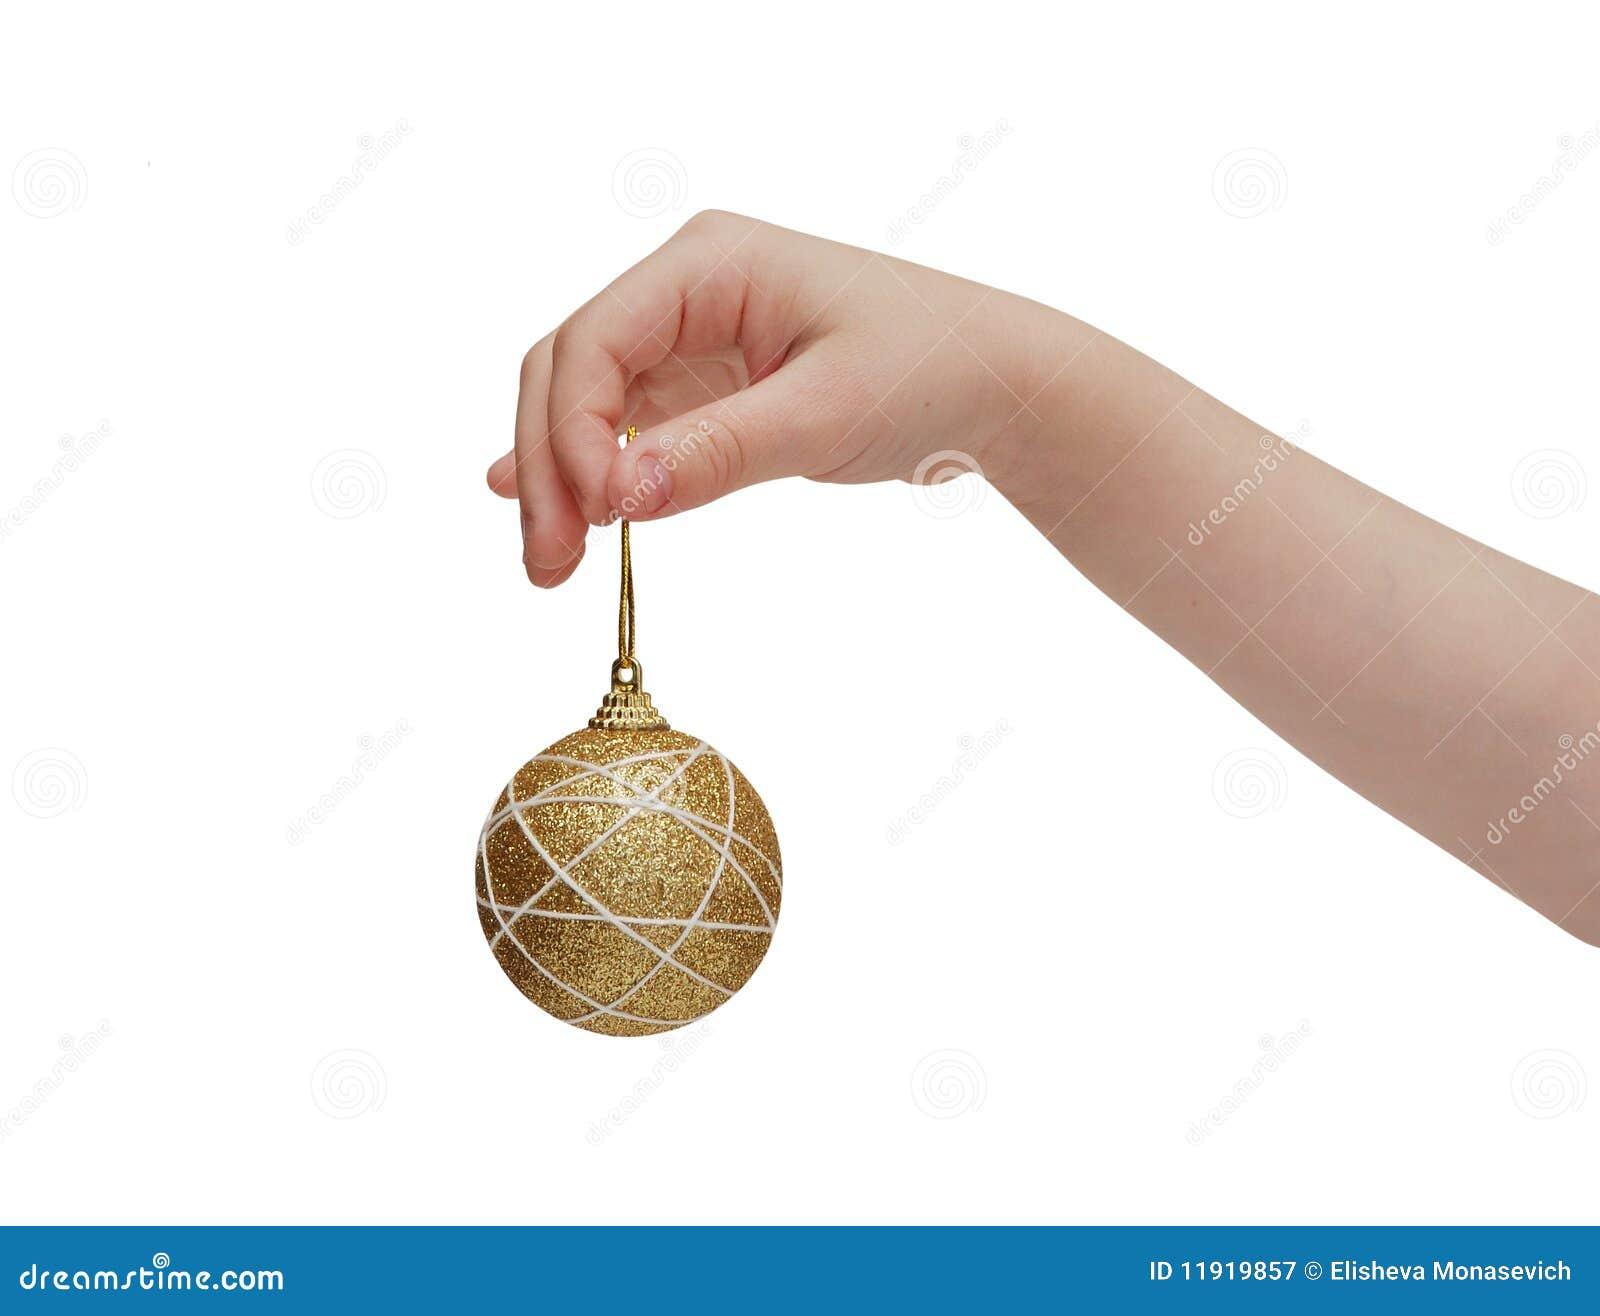 Child Hand Holding Golden Christmas Ball Royalty Free Stock ...